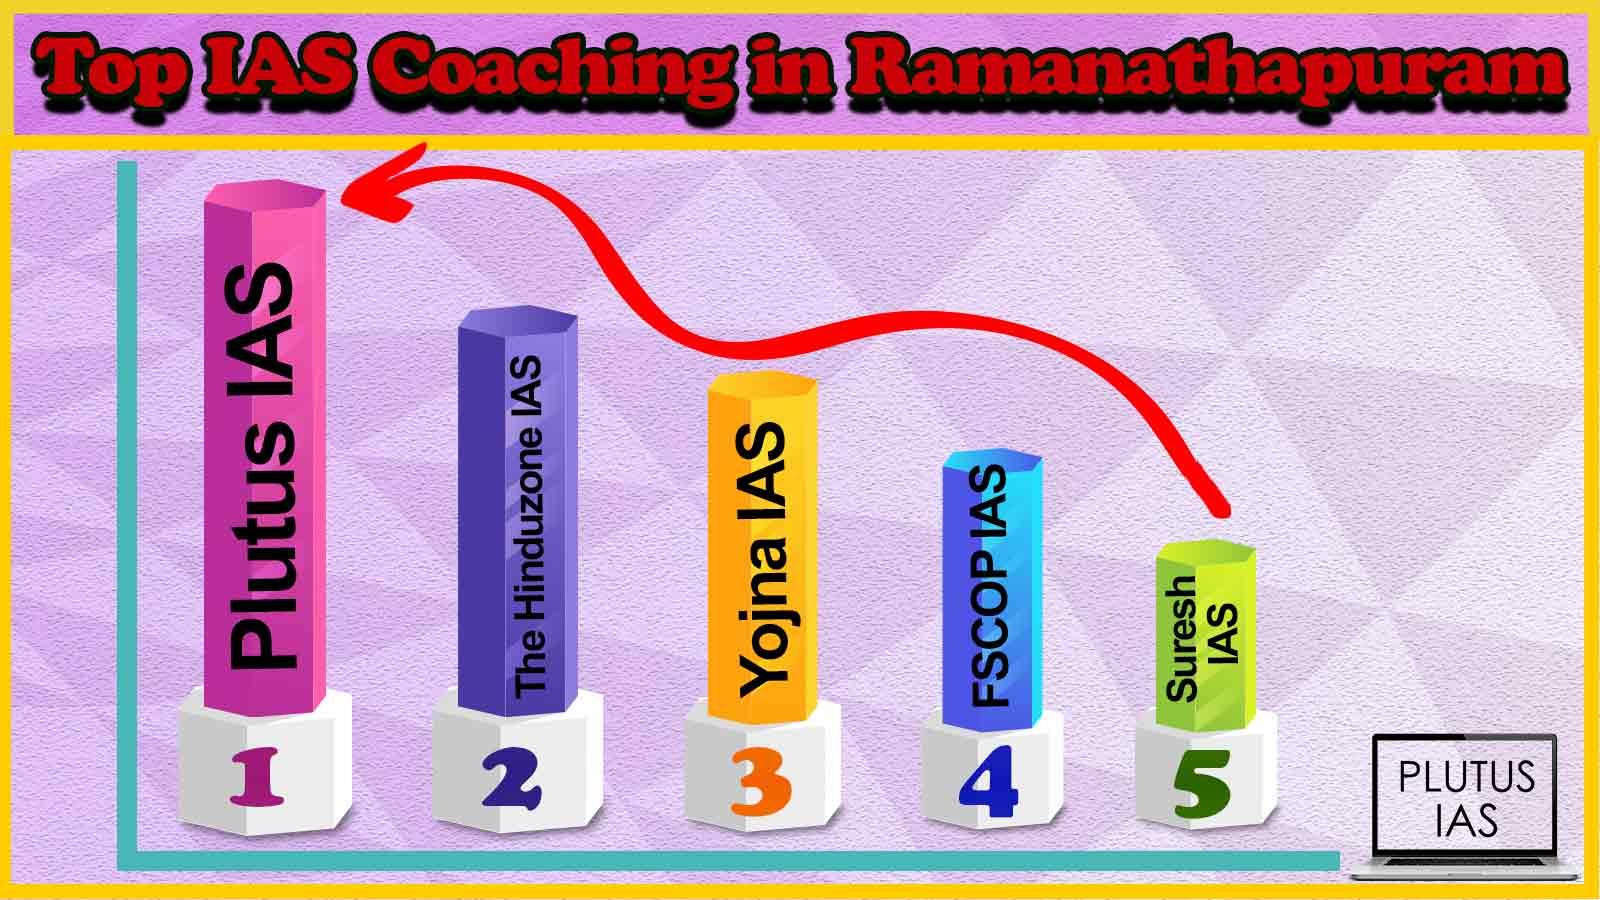 Best 10 IAS Coaching in Ramanathapuram